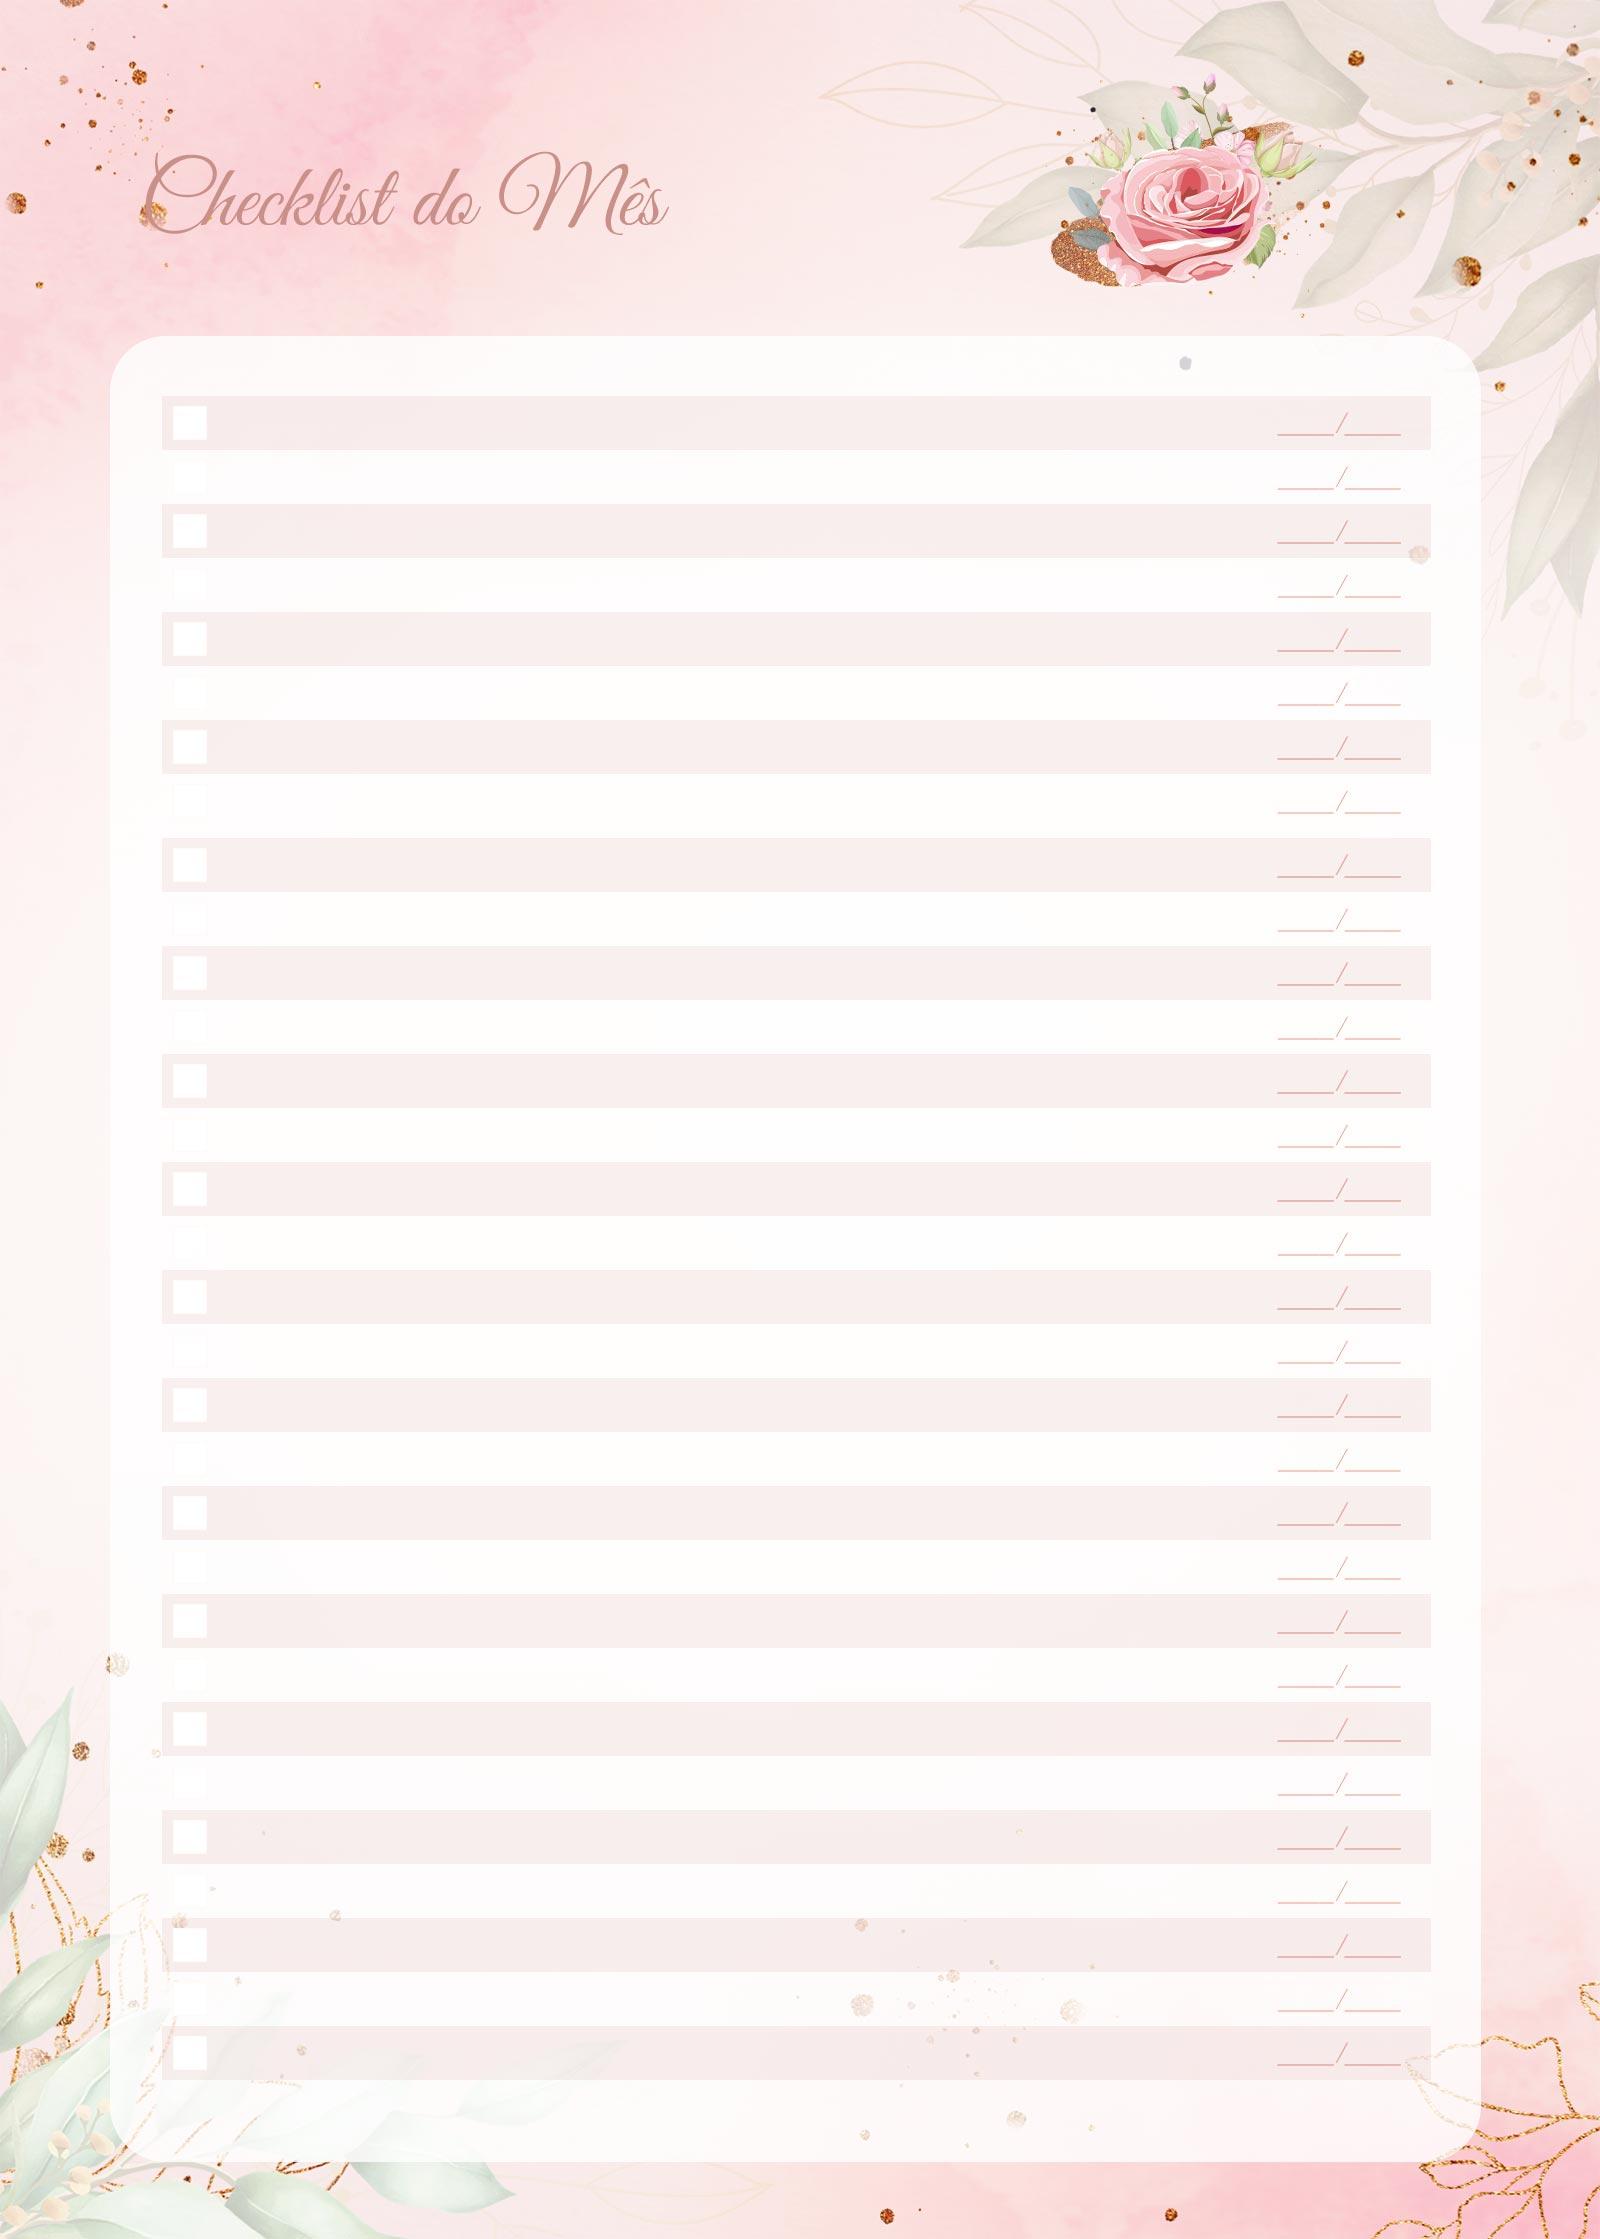 Planner 2021 Floral com Inicial Checklist Mensal